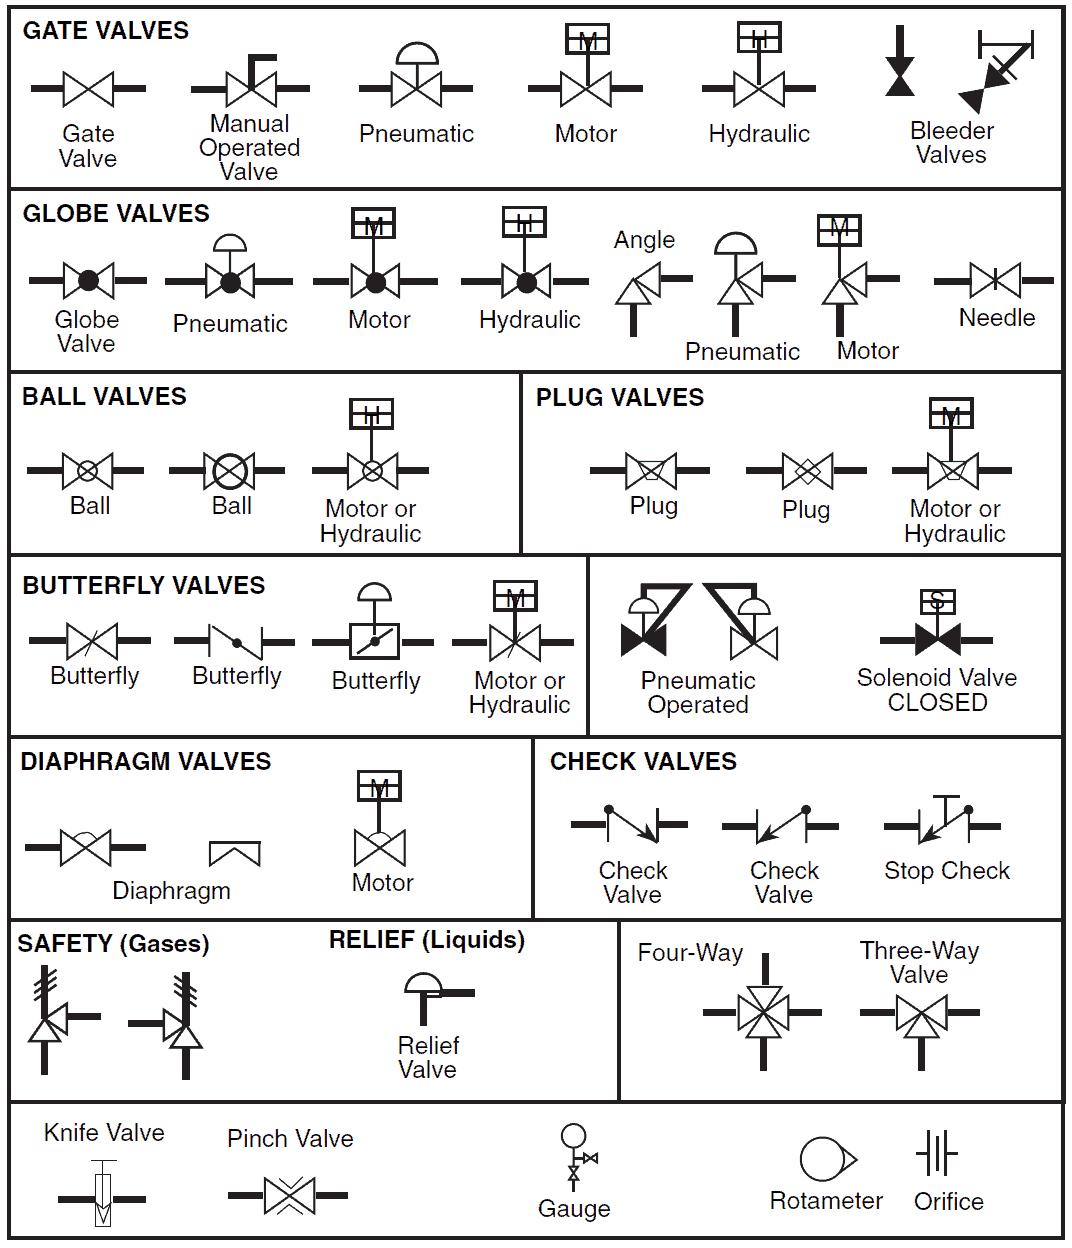 Valve P&ID Symbols